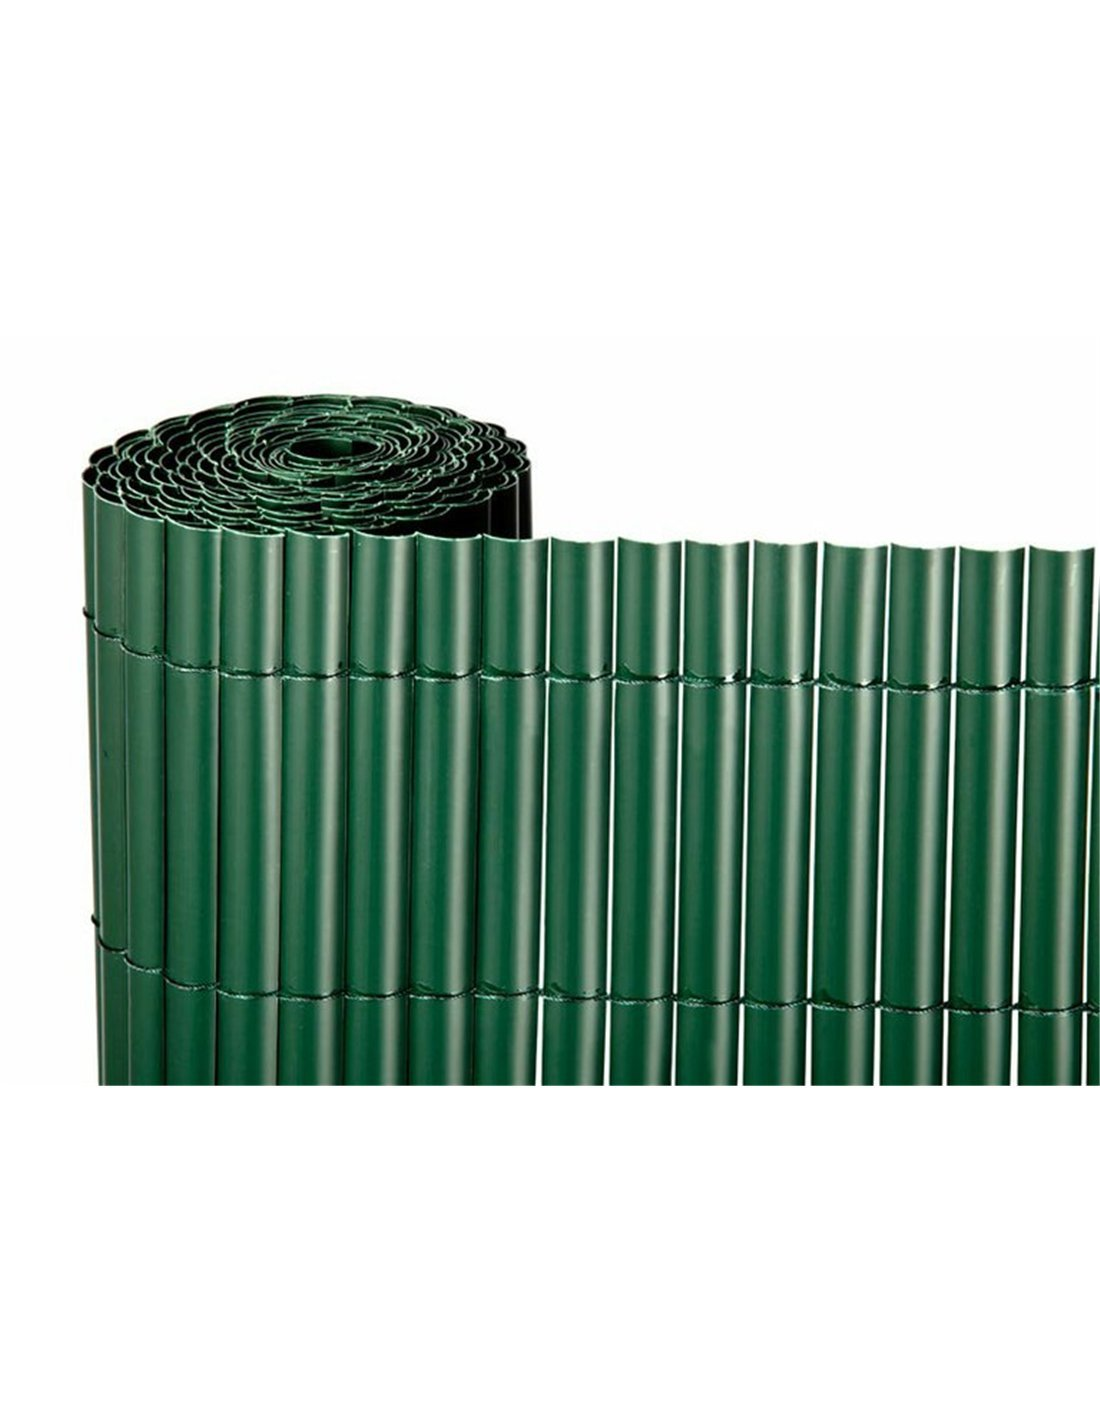 Jardin202 1x3m - CAÑIZO PVC Simple Cara Verde 900gr /3 Metros LINEALES